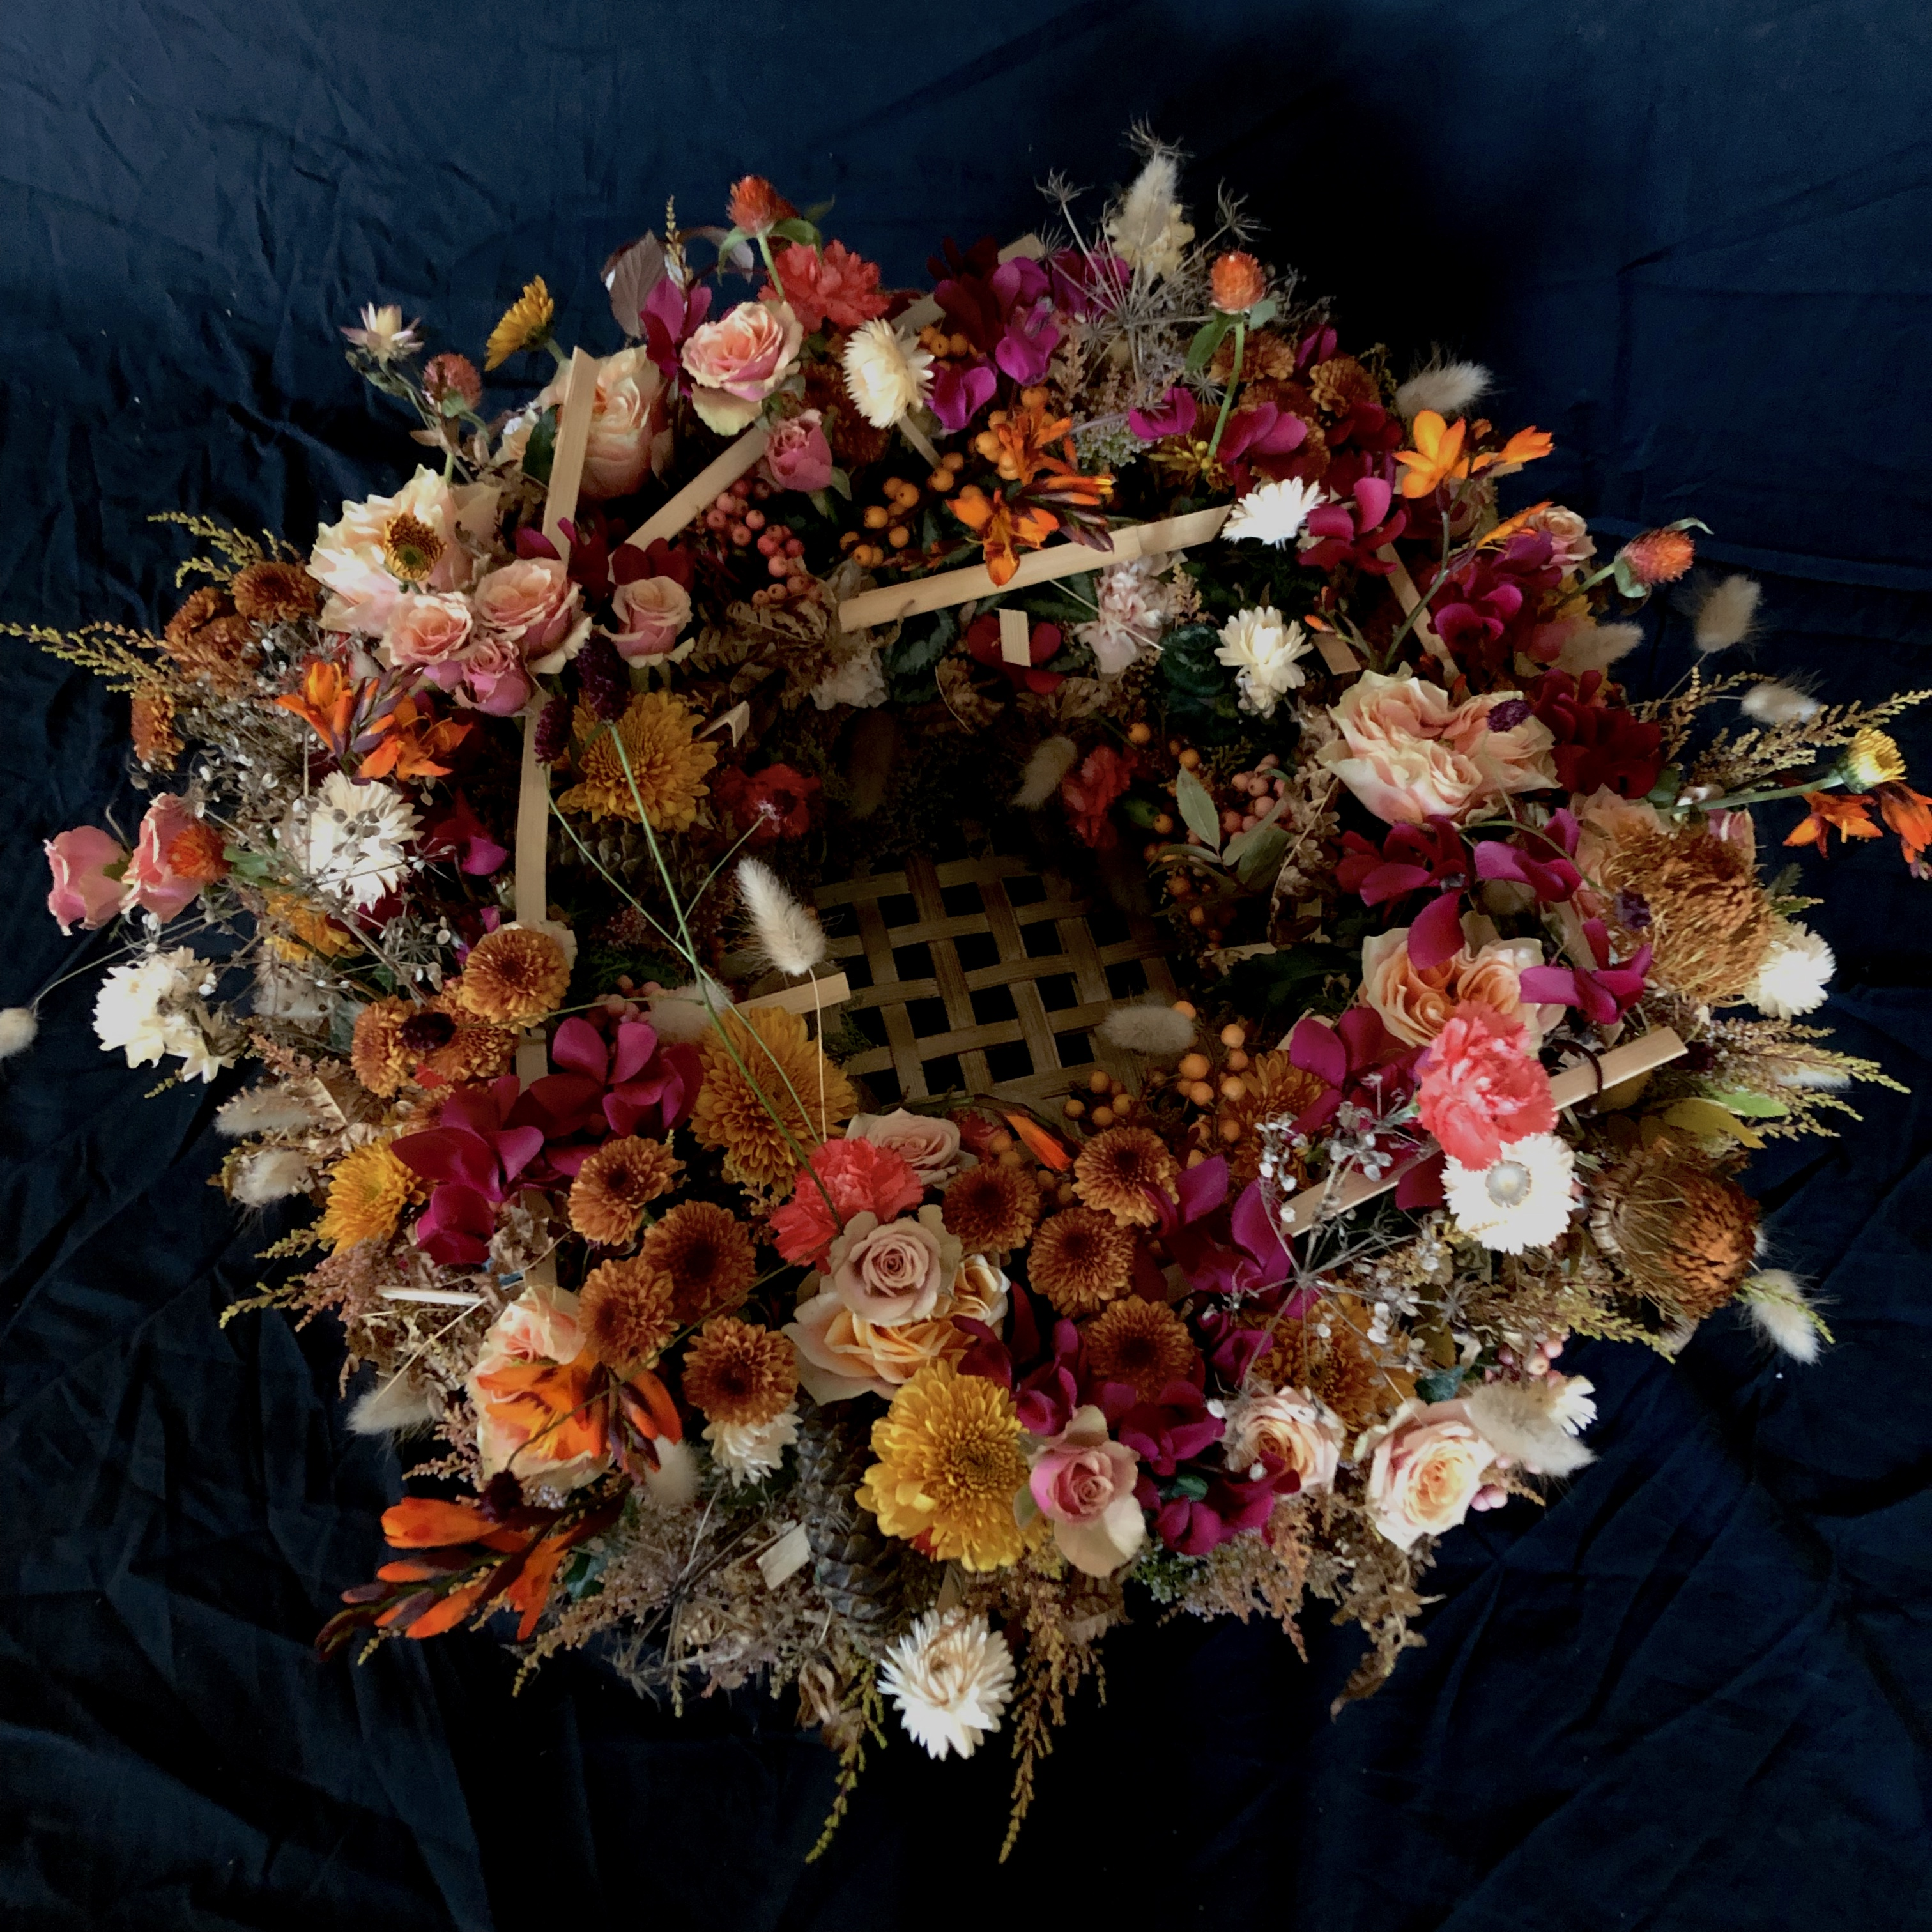 Blomstrande krans endast av naturmaterial